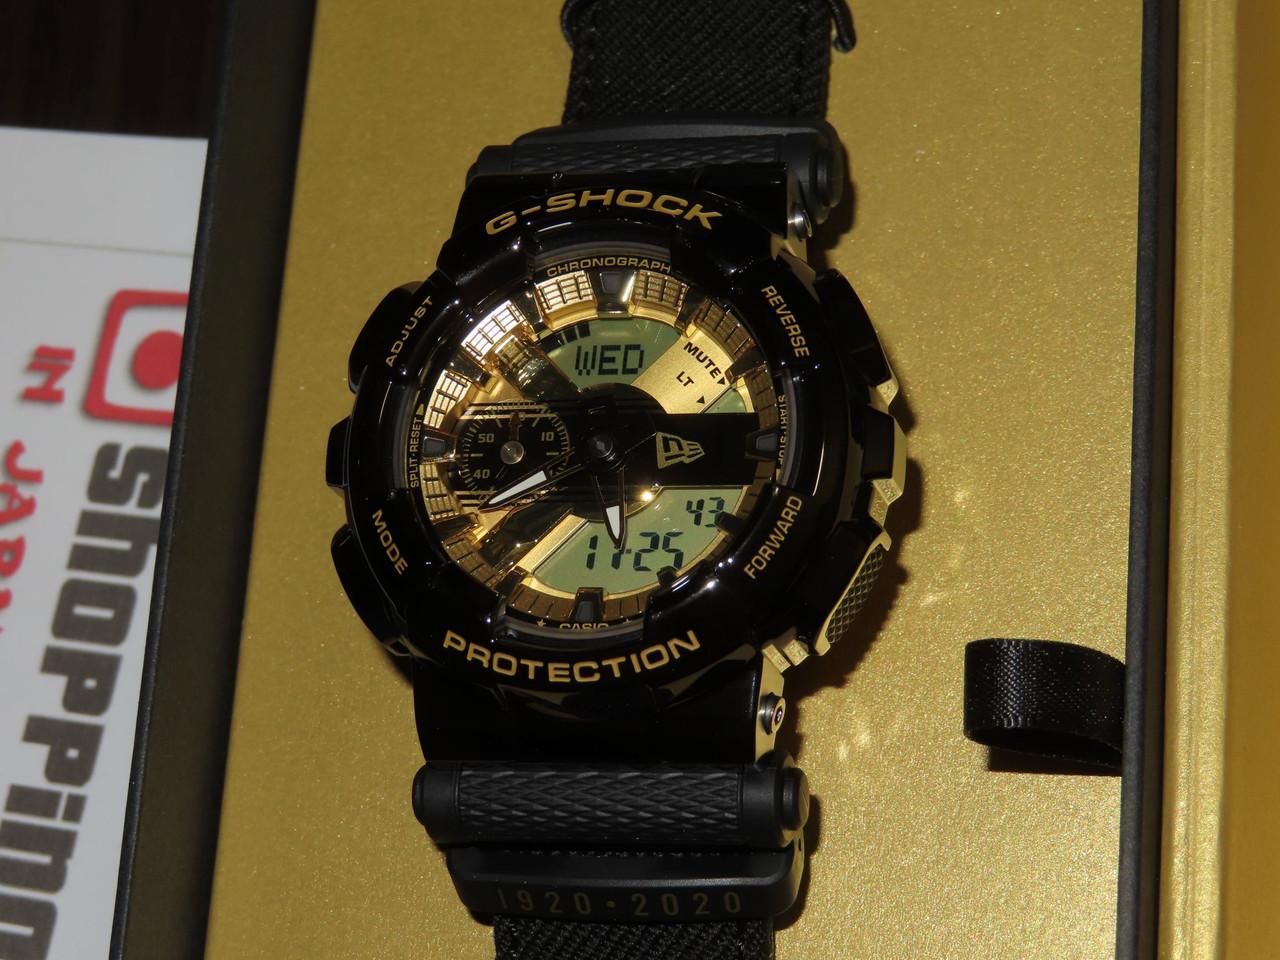 New Era x G-Shock Collaboration GM-110NE-1AJR